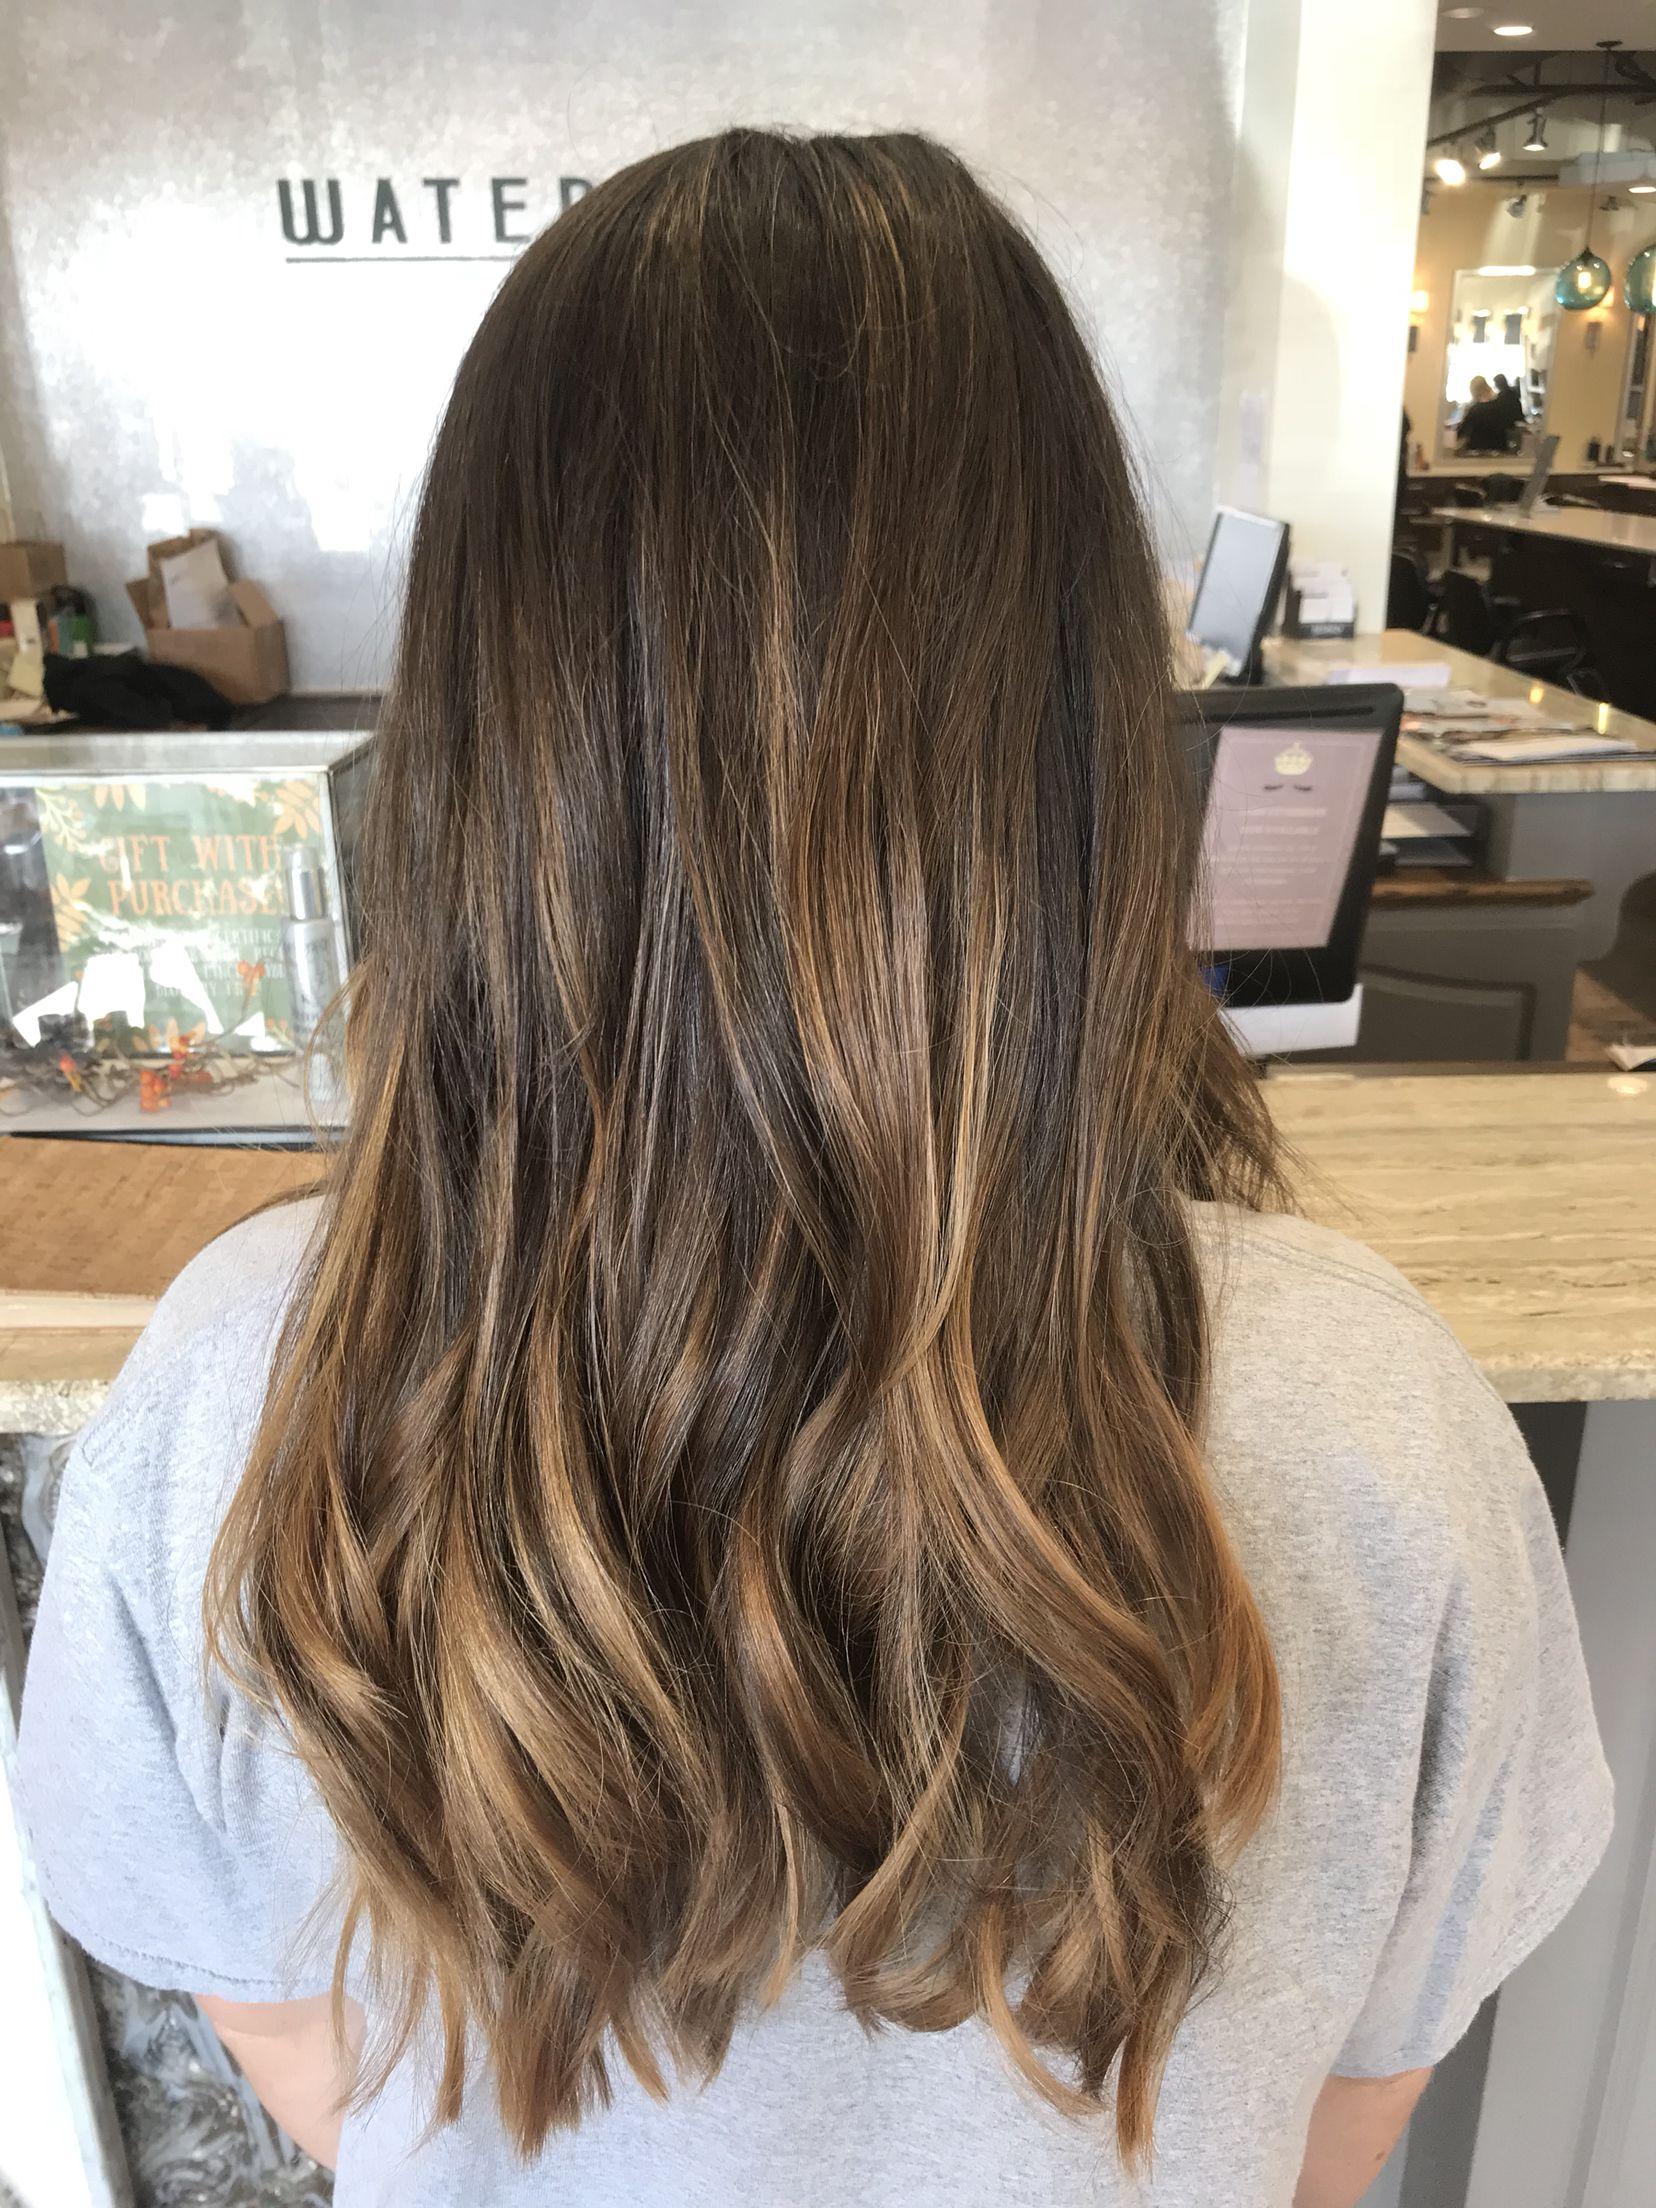 Subtle Balayage On Brunette Hair. Sun Kissed, Caramel Tones | Hair